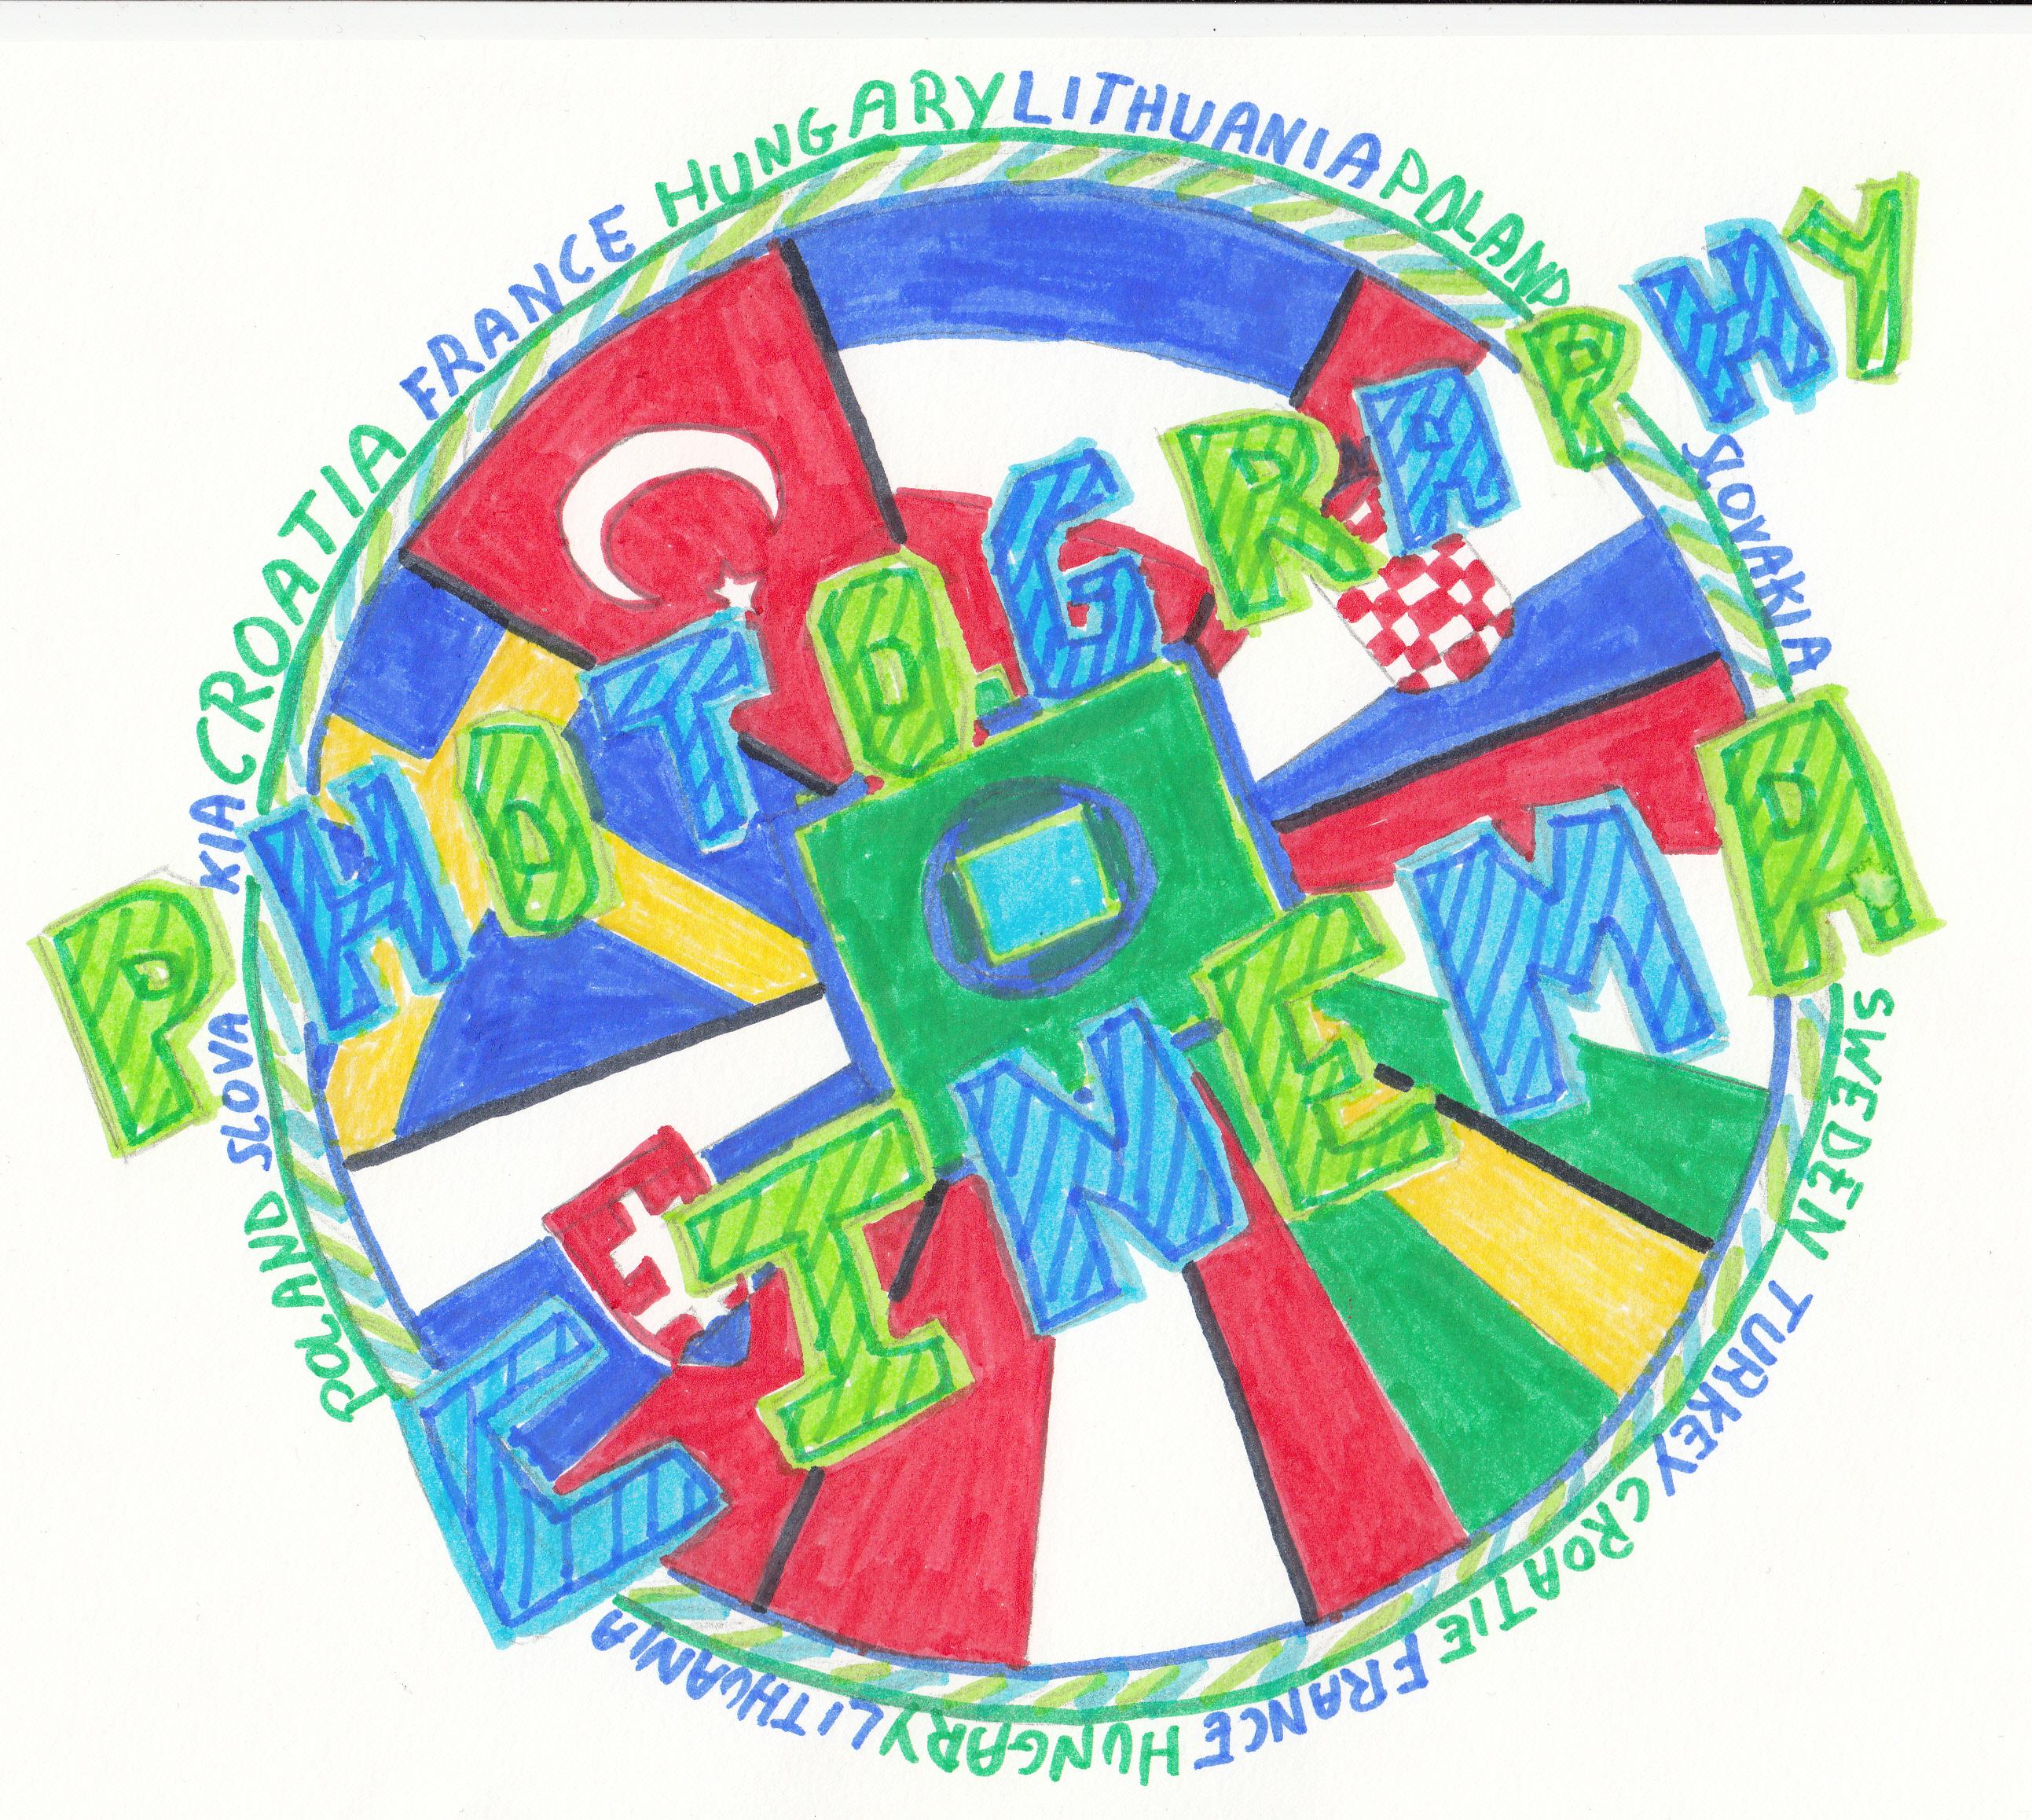 http://europeansectionlgm.typepad.fr/.a/6a00d8341e34a353ef01a73db4f9bc970d-pi